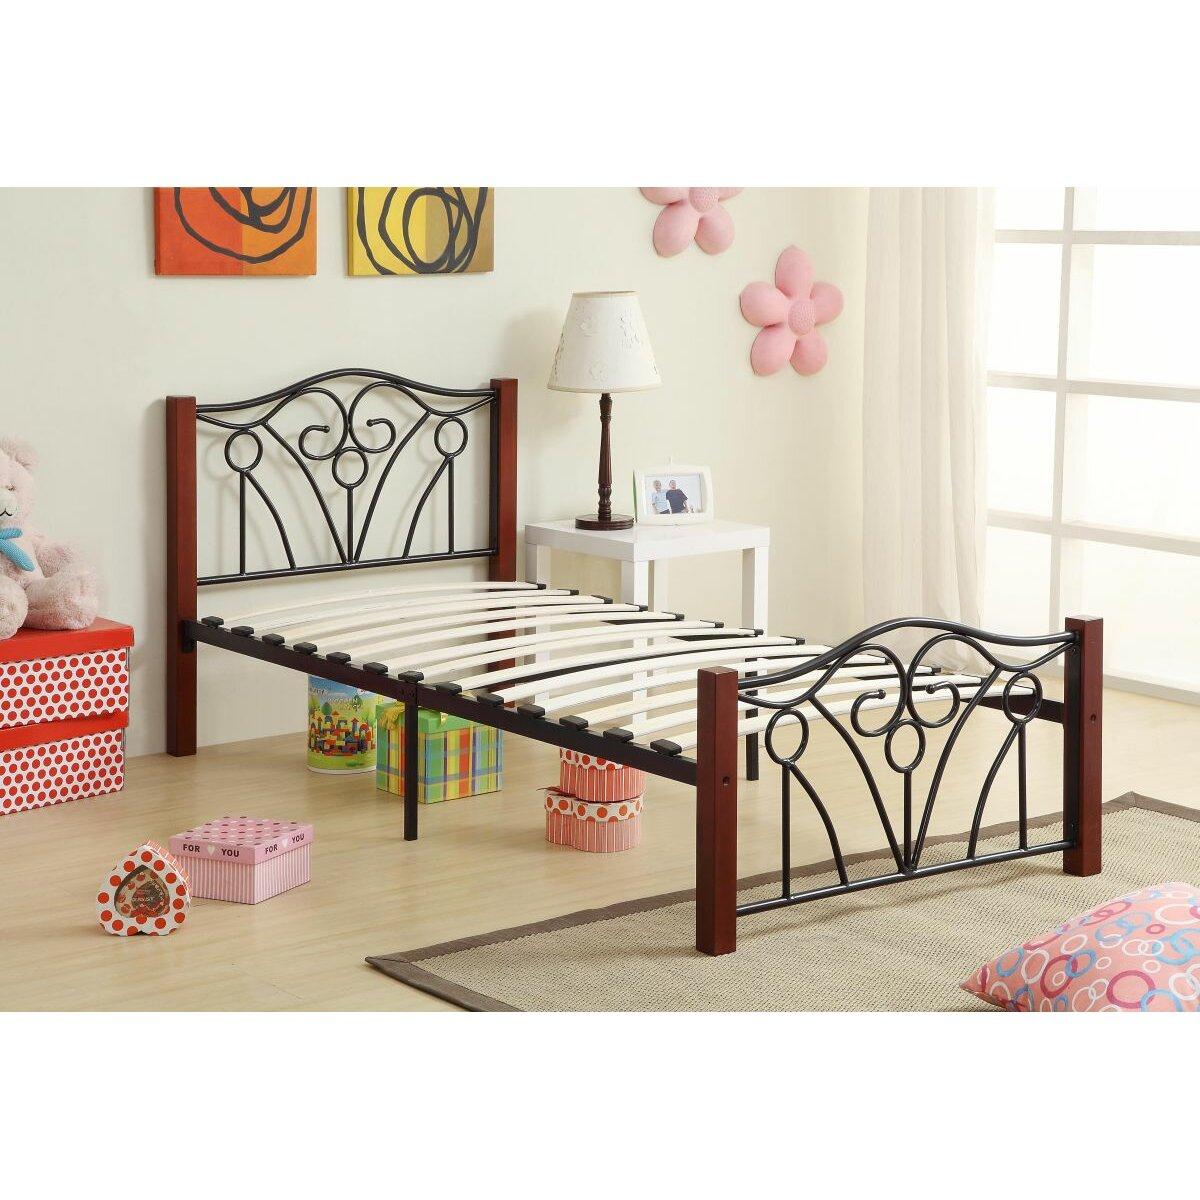 williams import co avanti panel bed reviews wayfair. Black Bedroom Furniture Sets. Home Design Ideas